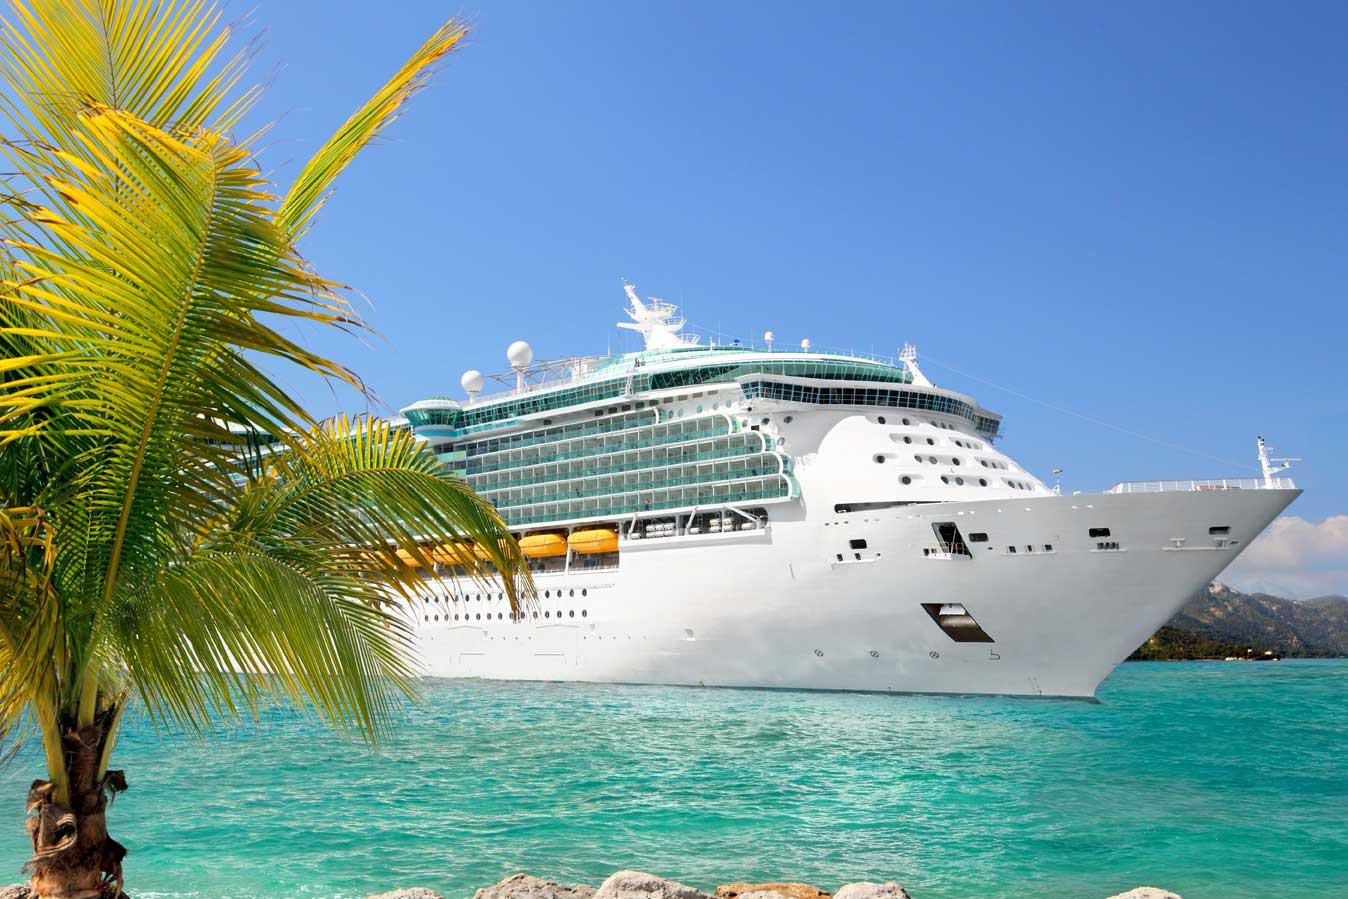 cruceros viajes irsemar madrid